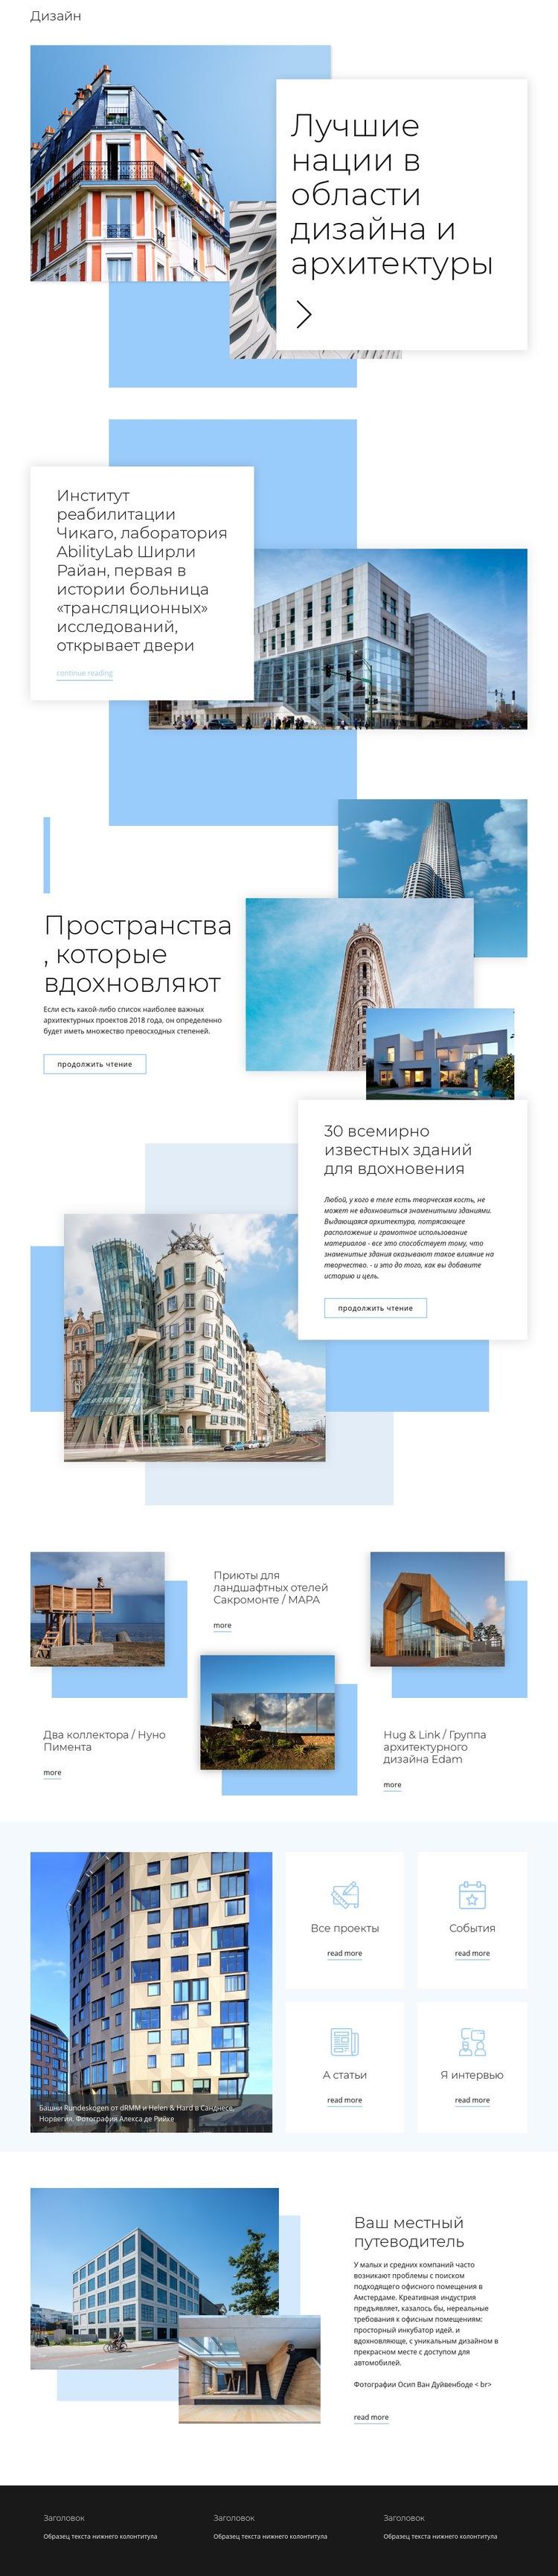 Рейтинг по архитектуре Шаблон веб-сайта